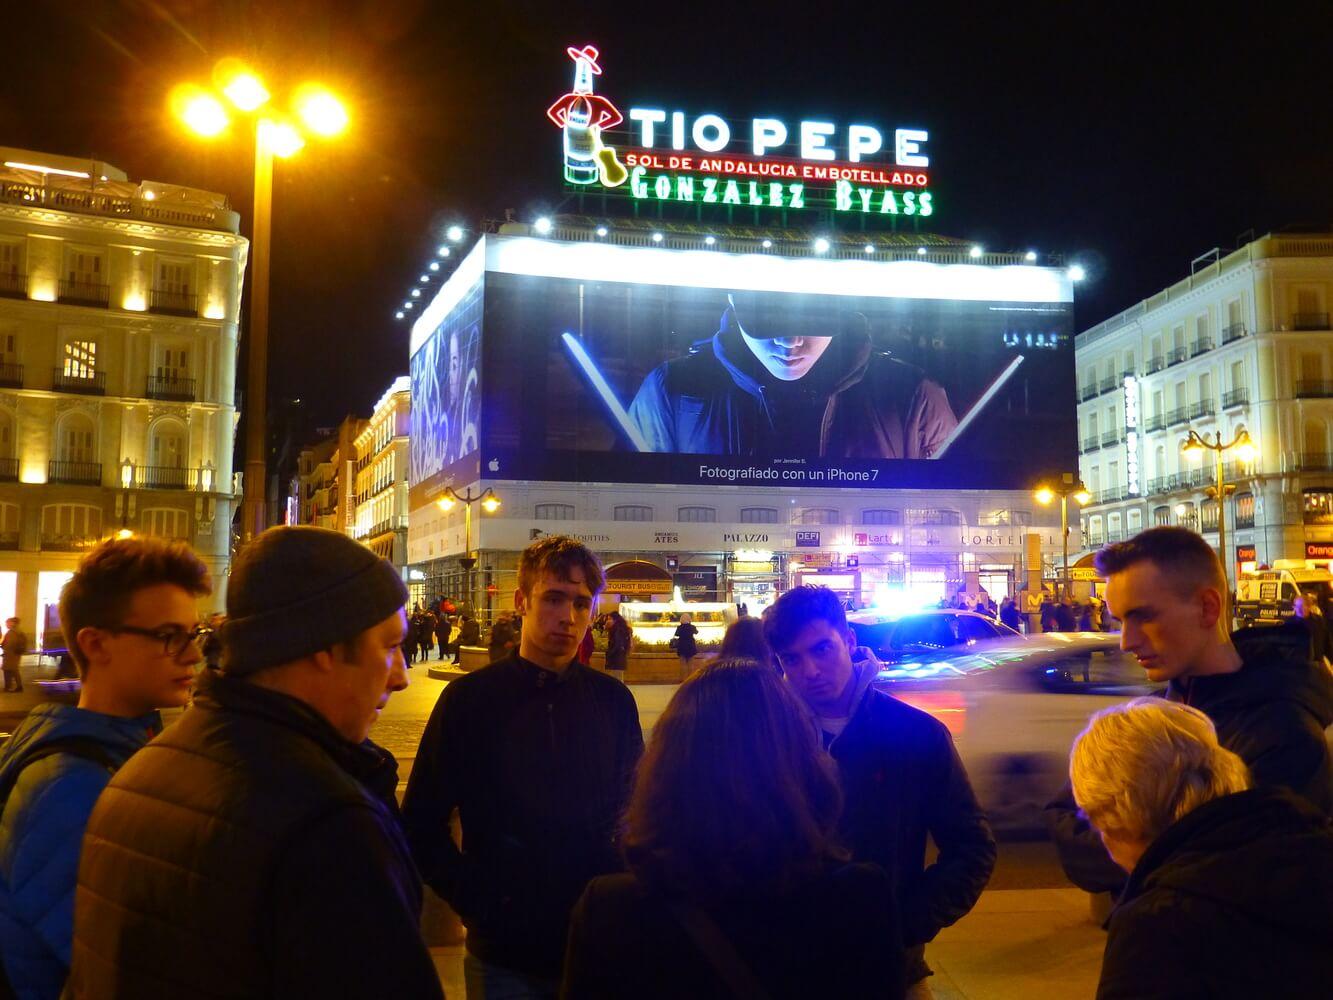 Visit of students of Manchester Grammar School, Puerta de Sol, Tio Pepe